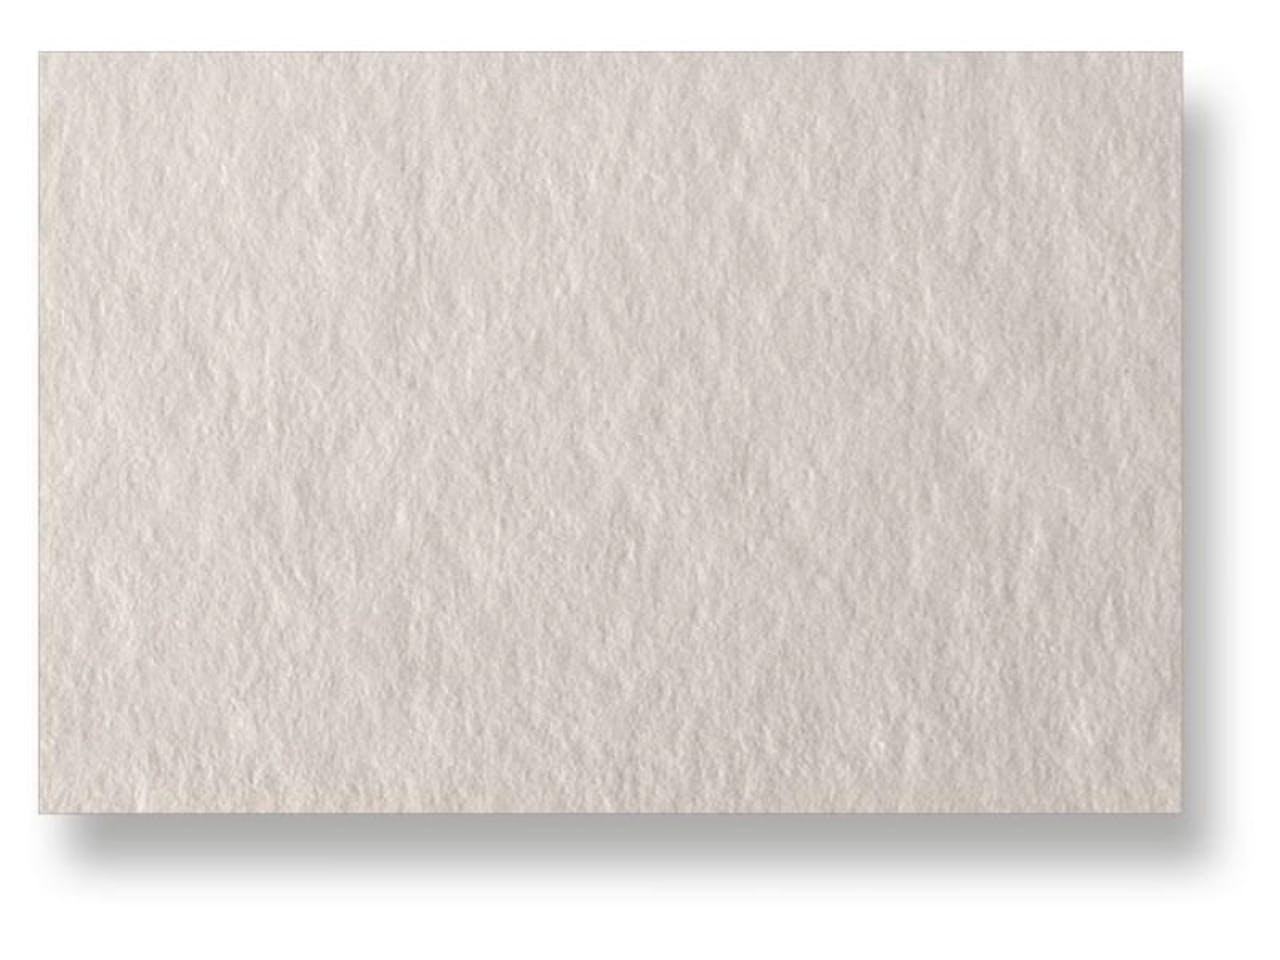 Hahnemühle Aquarellkarton Torchon, 275 g/m²